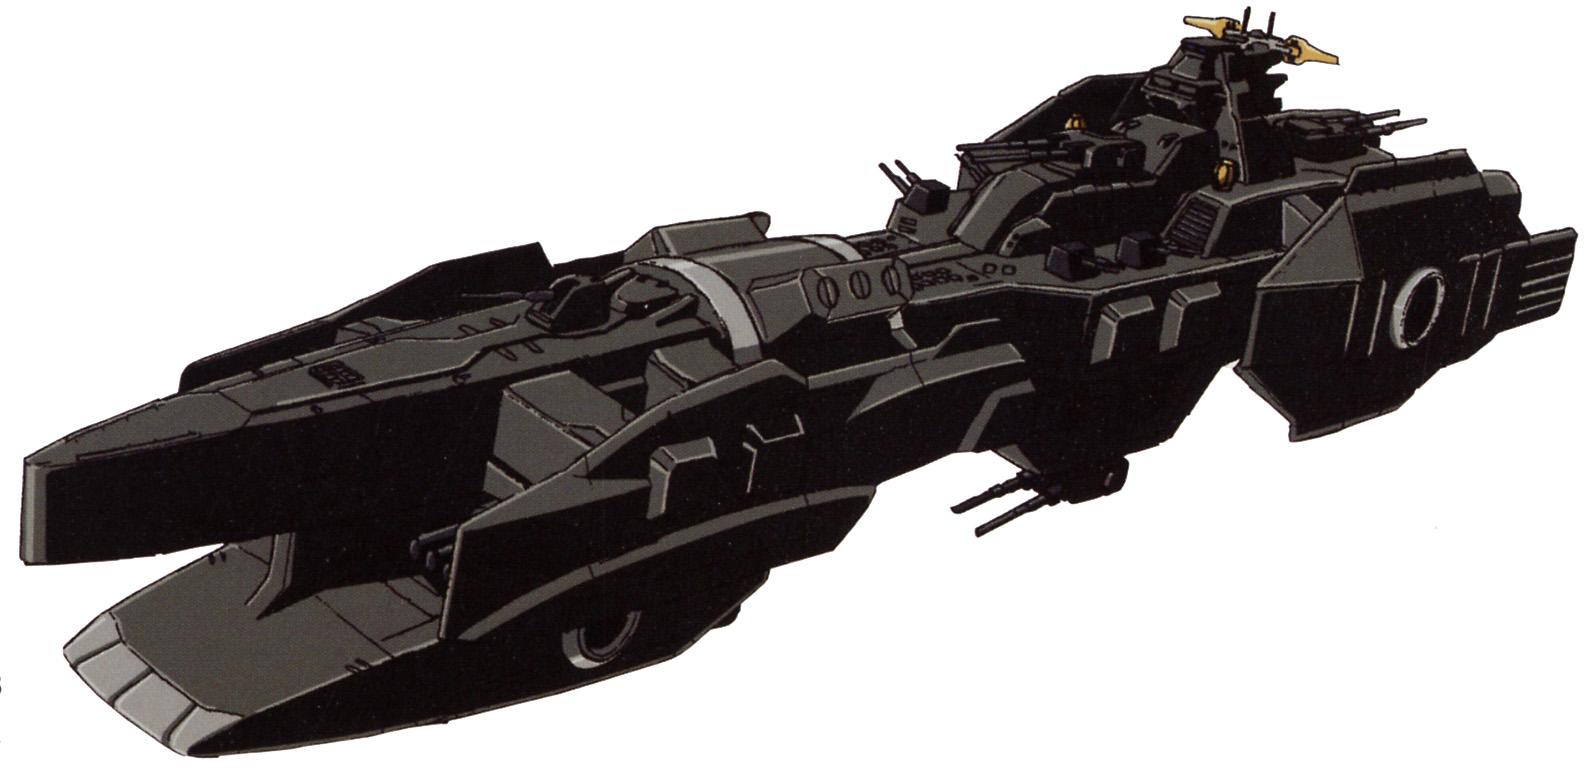 File:250-metre class warship (gundam).jpg